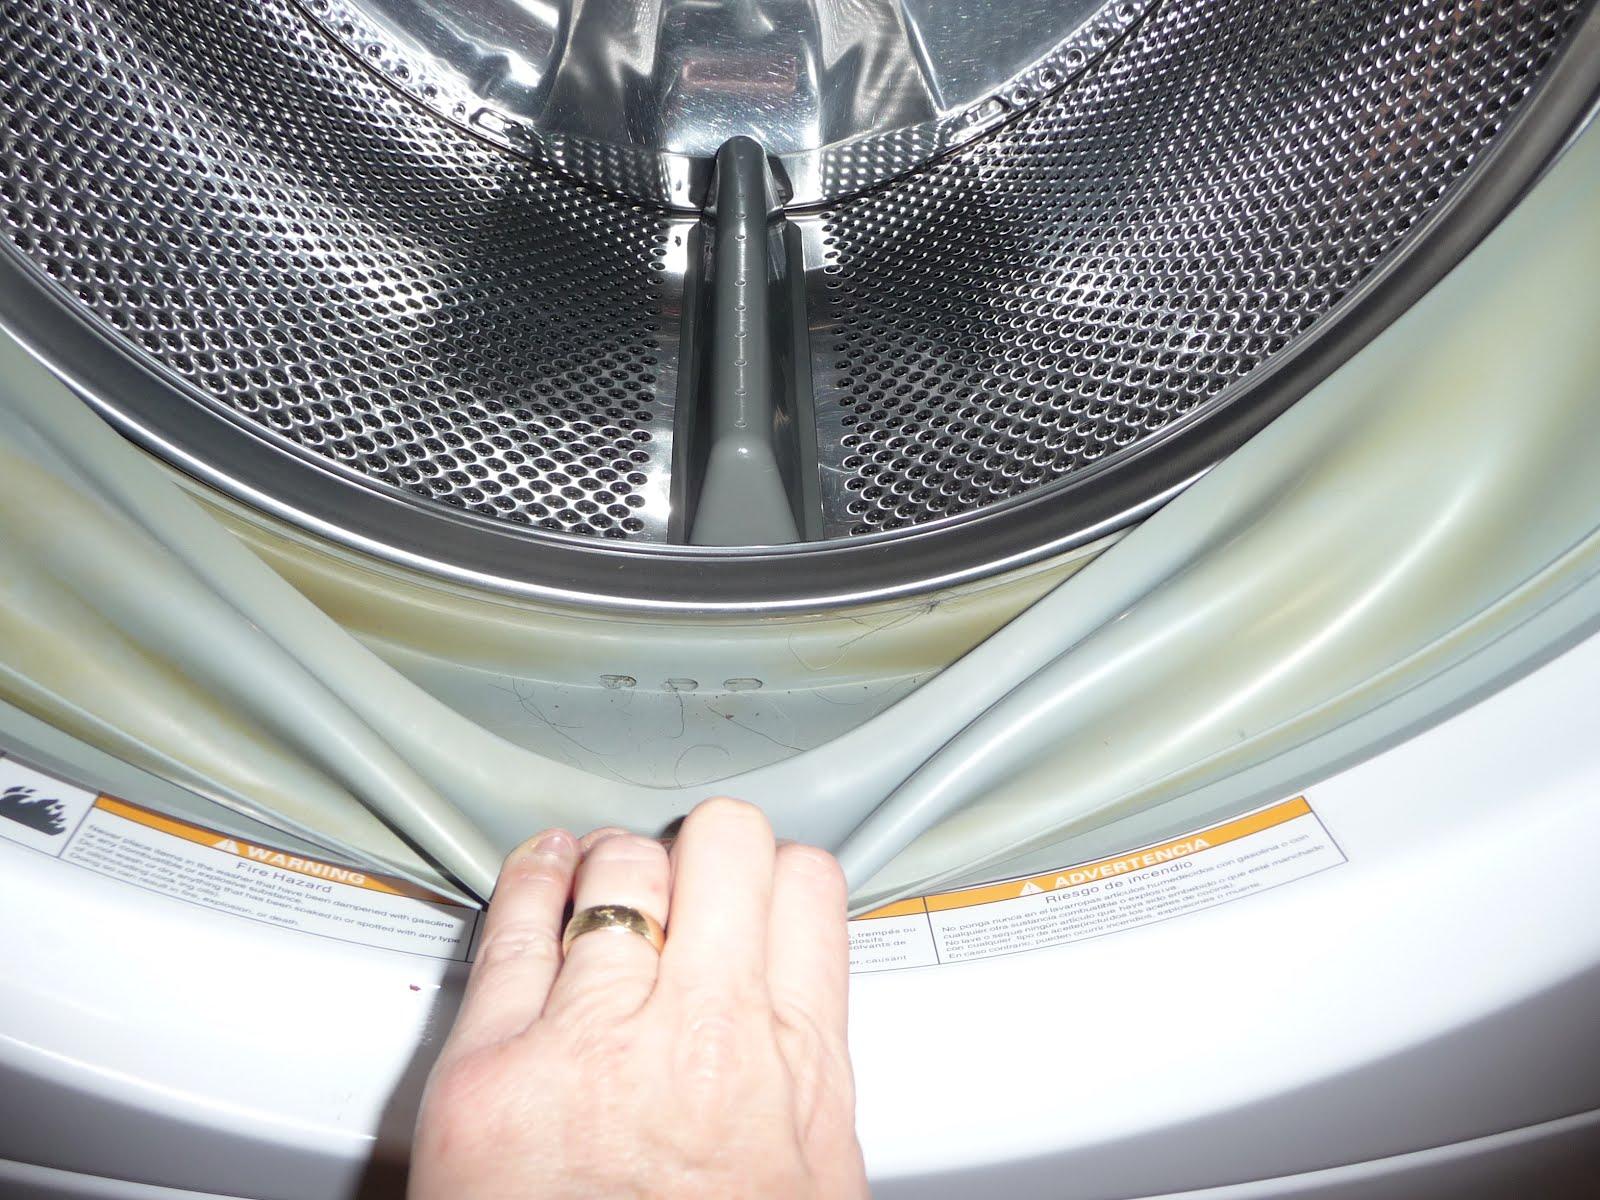 washing machine filter cleaning